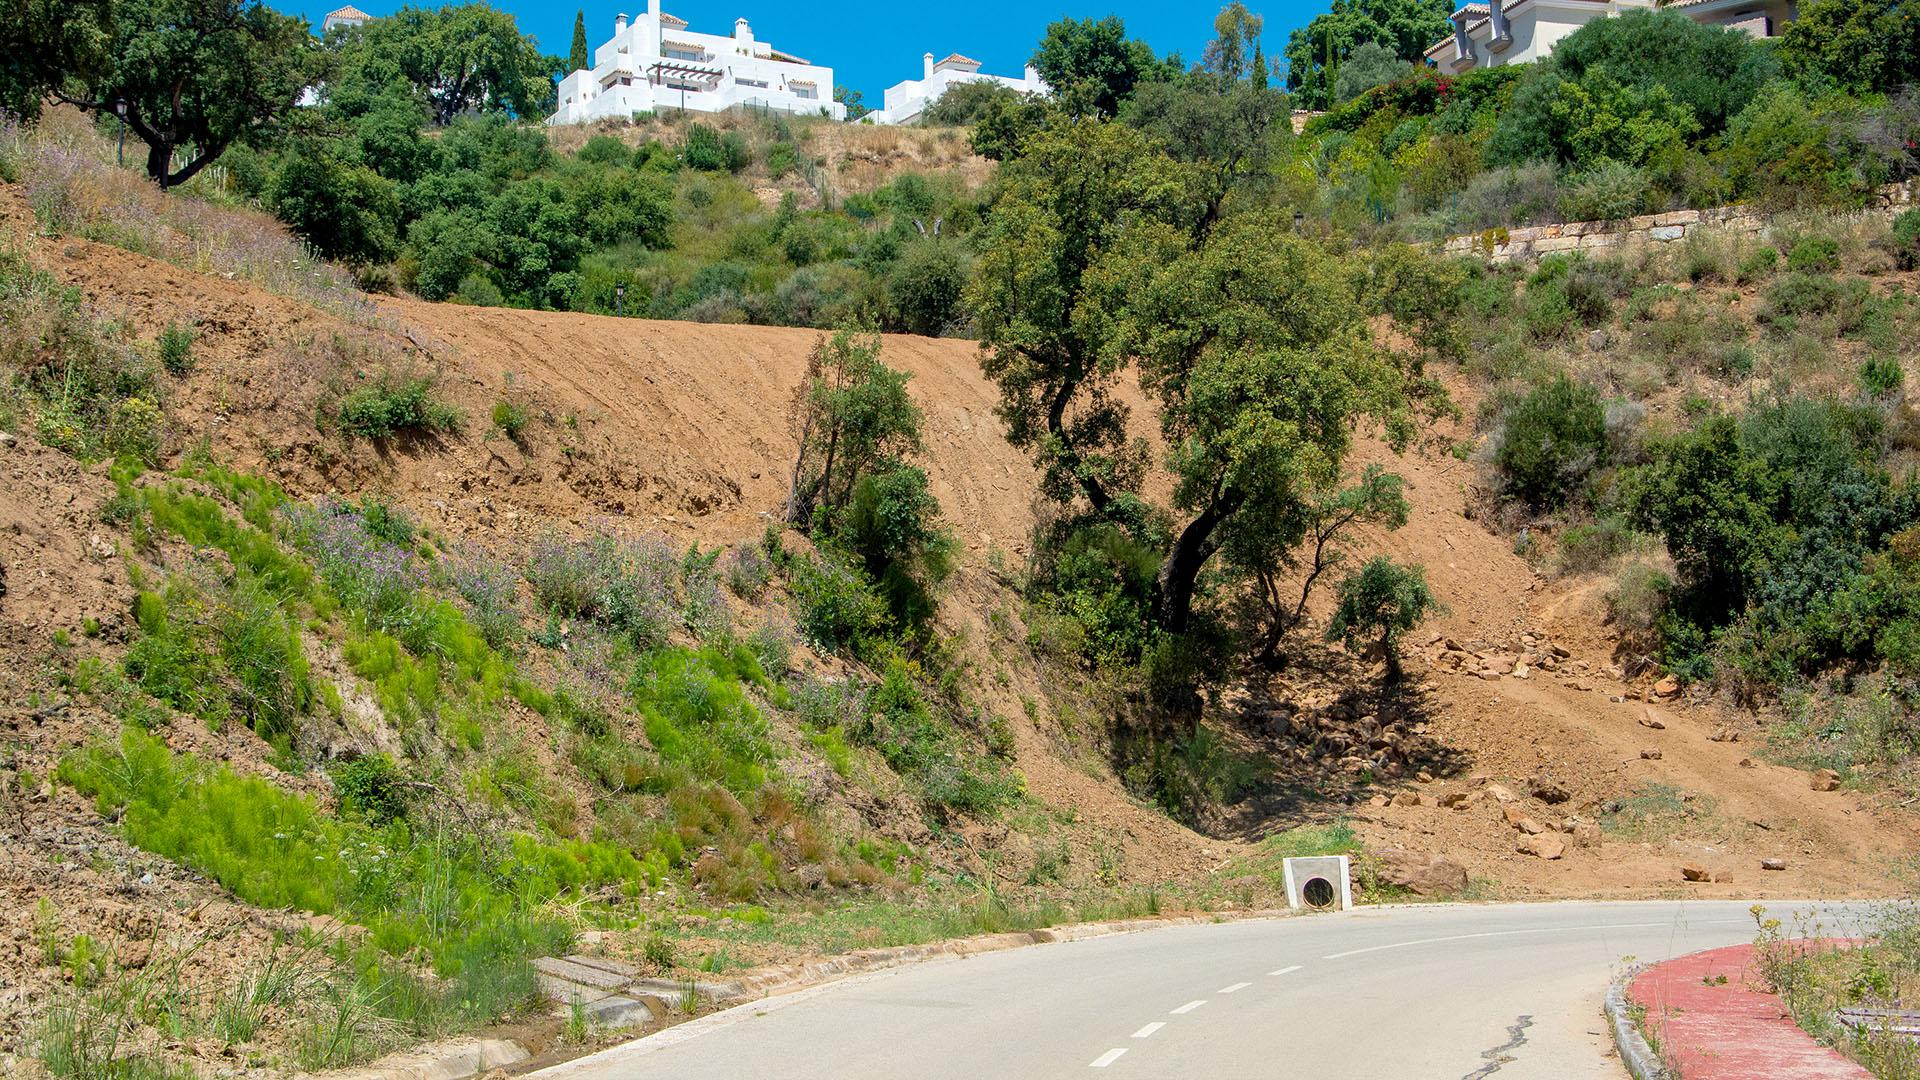 Villa La Mairena 1511: Moderne villa aan de oostkant van Marbella